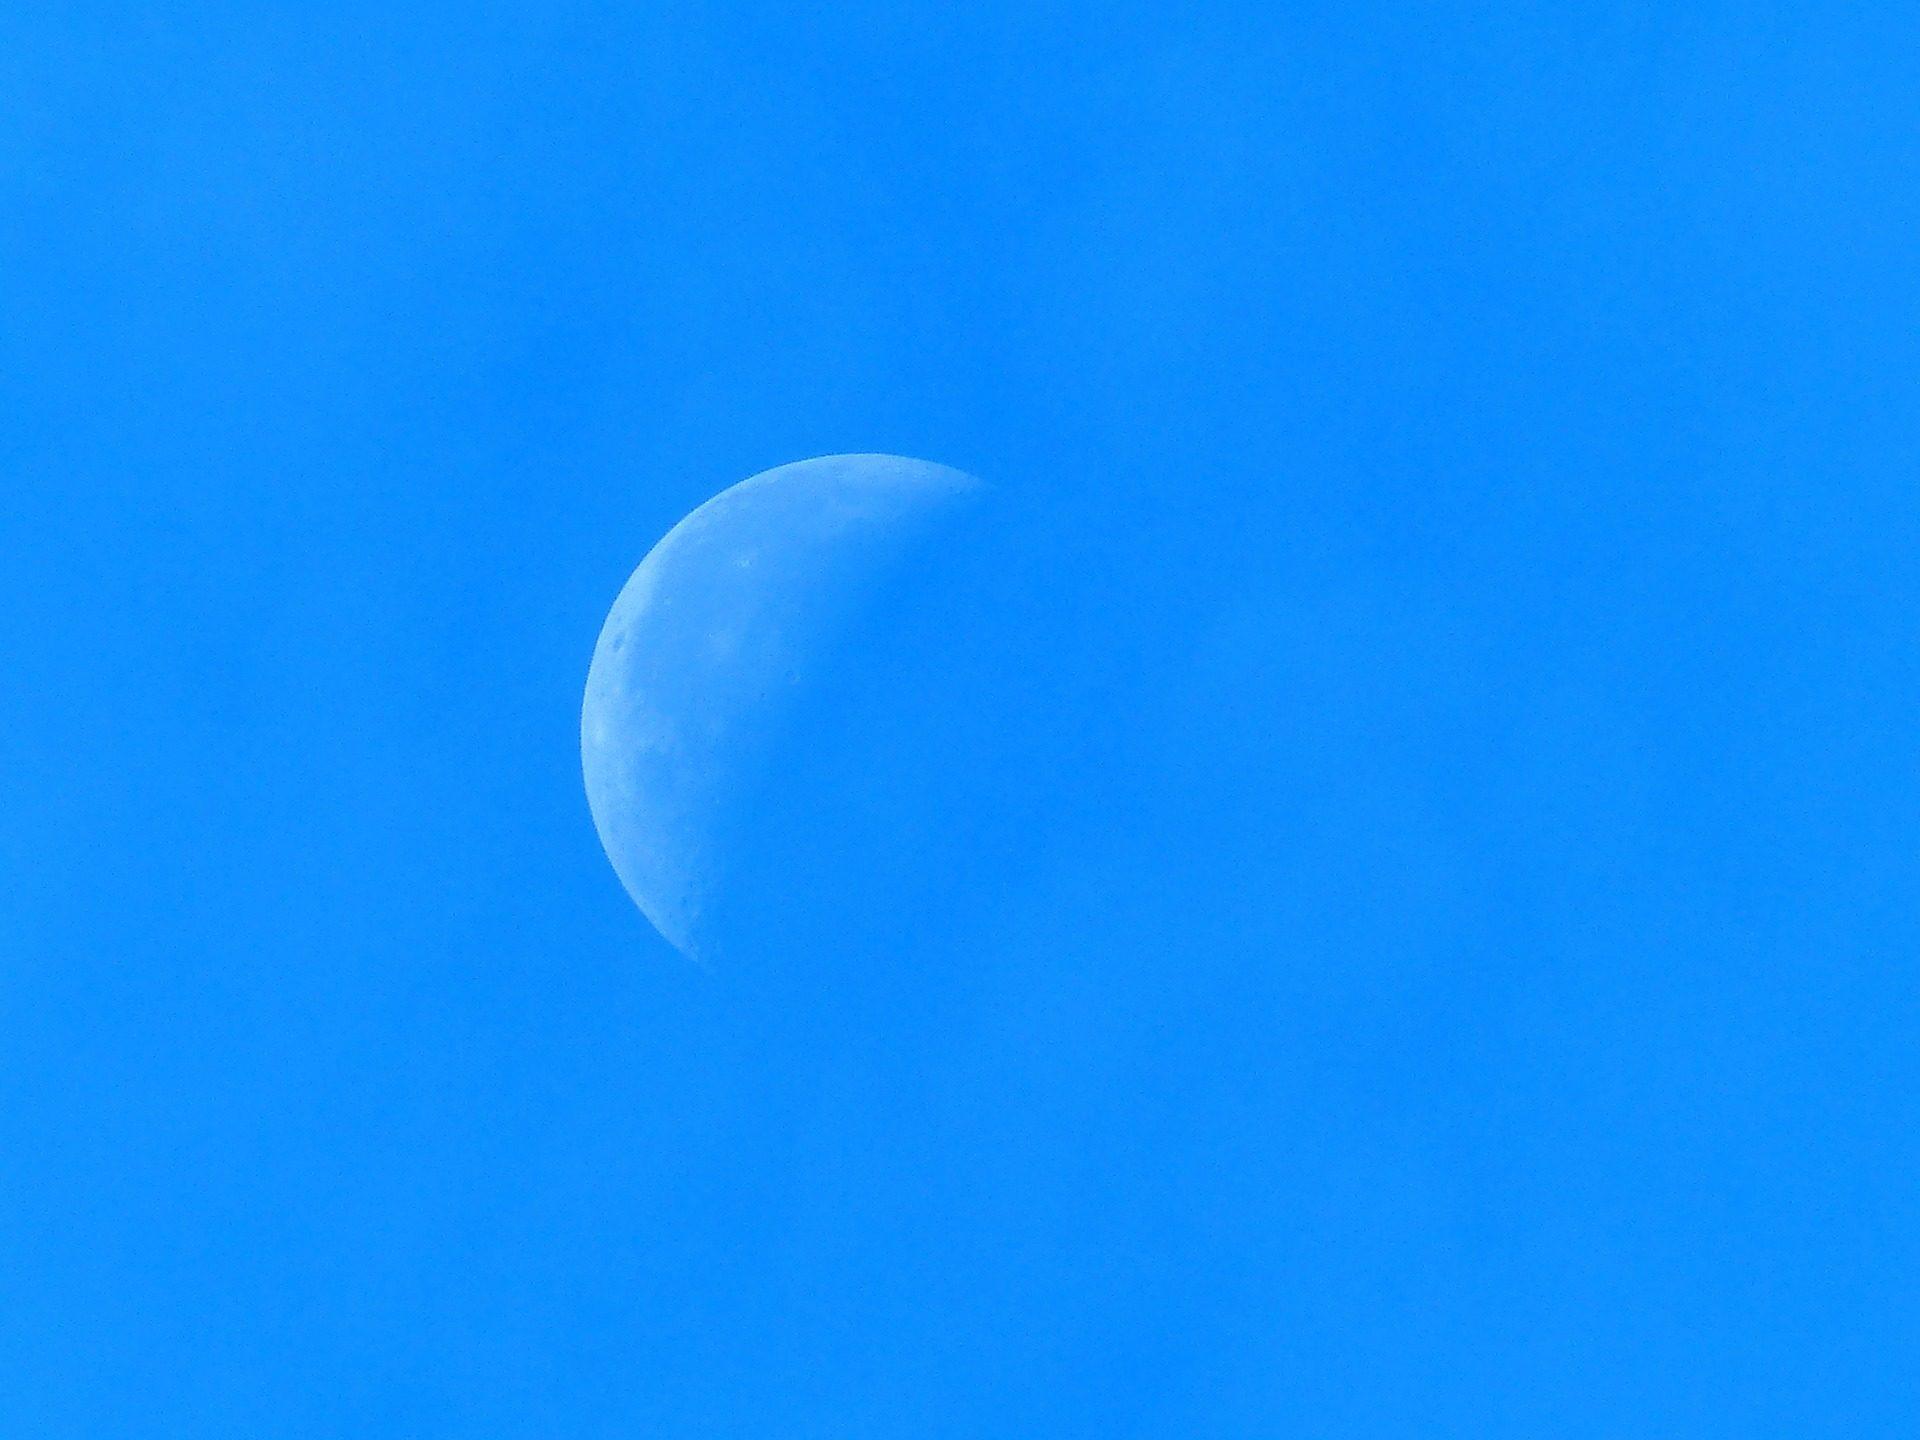 Lua, Céu, dia, Astro, crescendo - Papéis de parede HD - Professor-falken.com